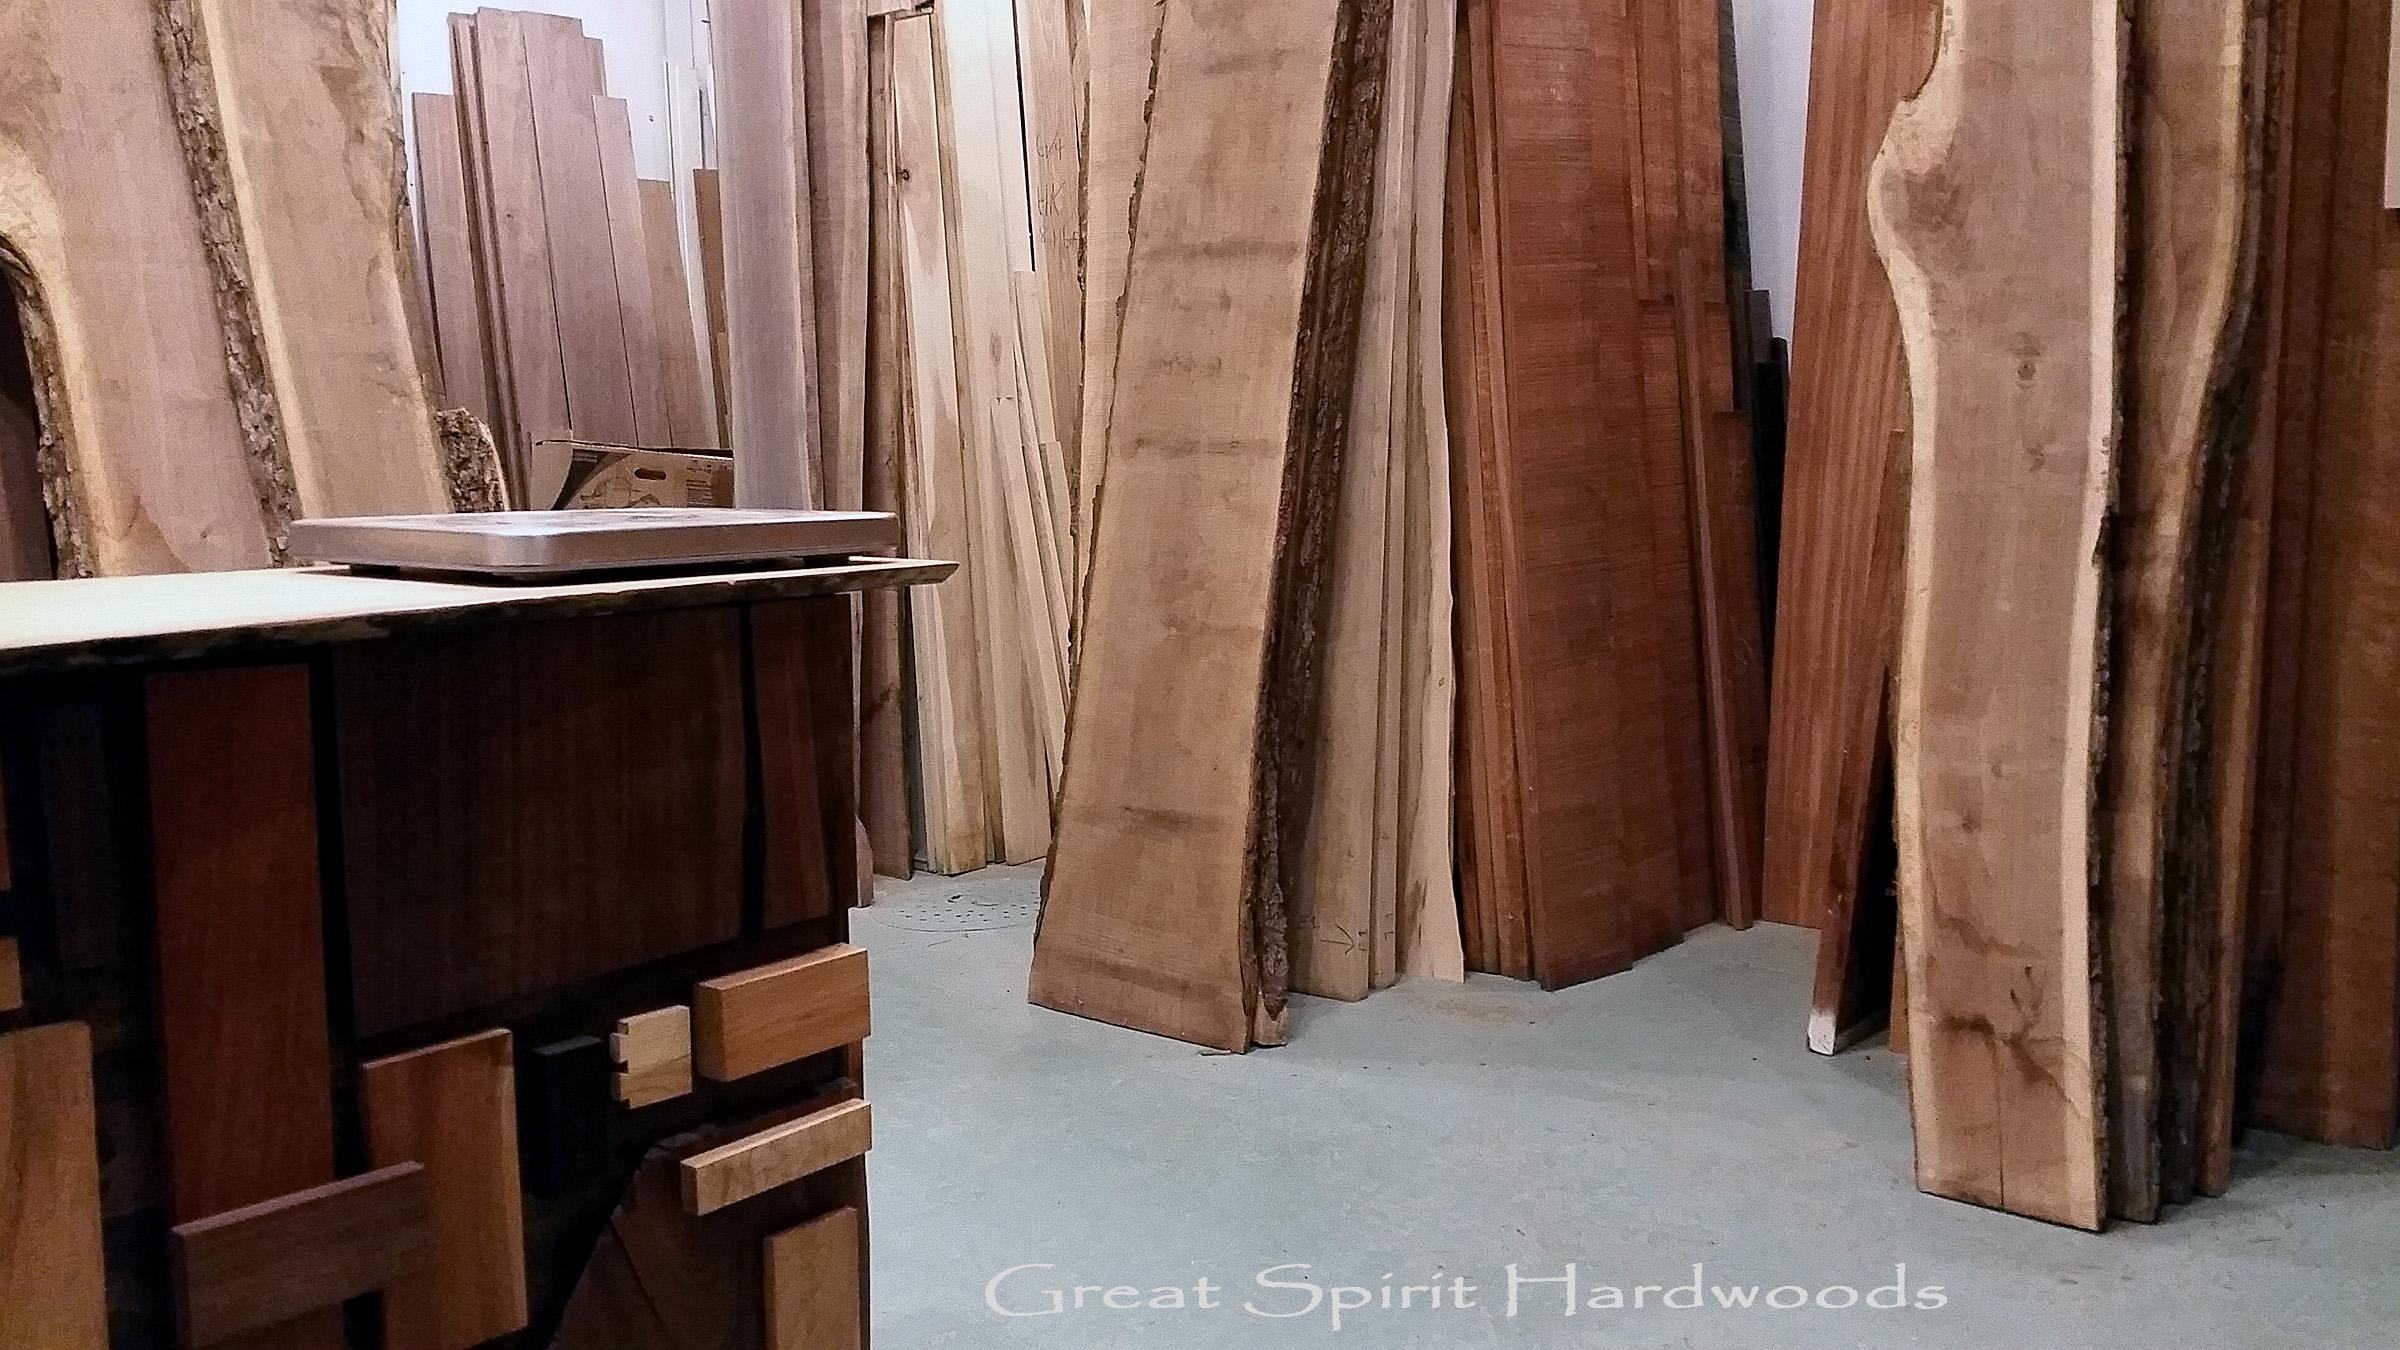 Hardwood lumber store great spirit hardwoods in dundee il